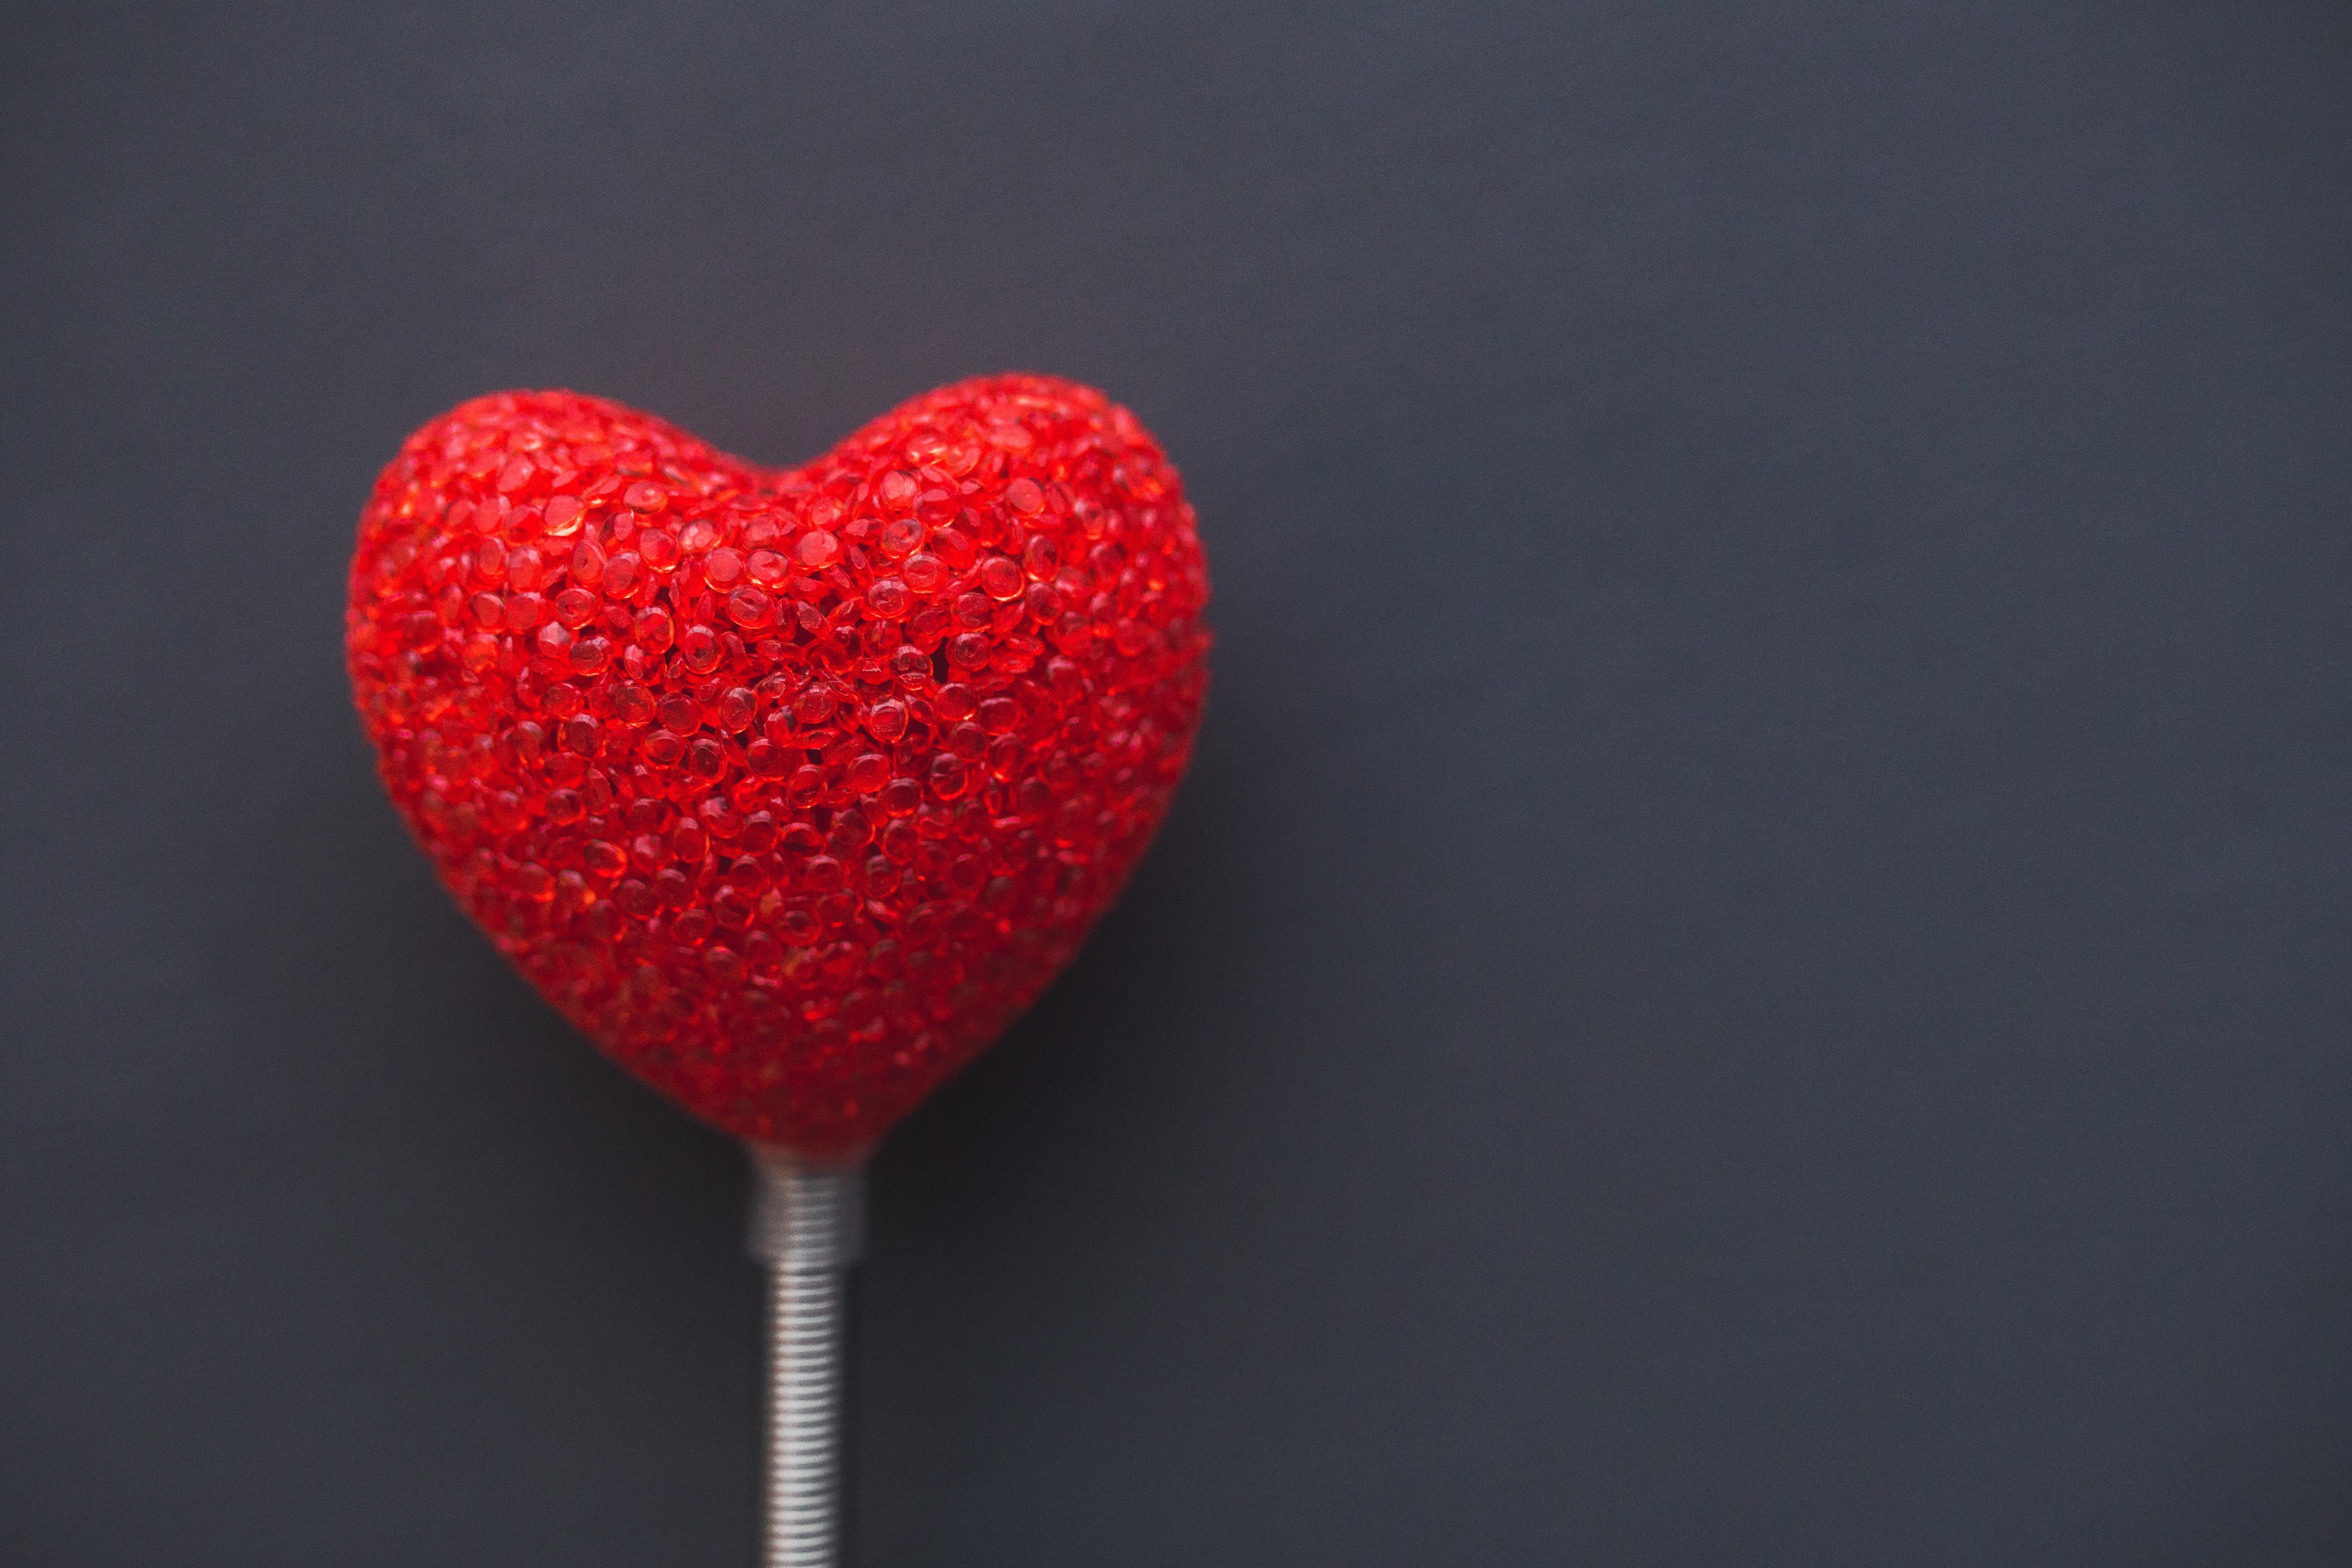 red-love-heart-valentines.jpg